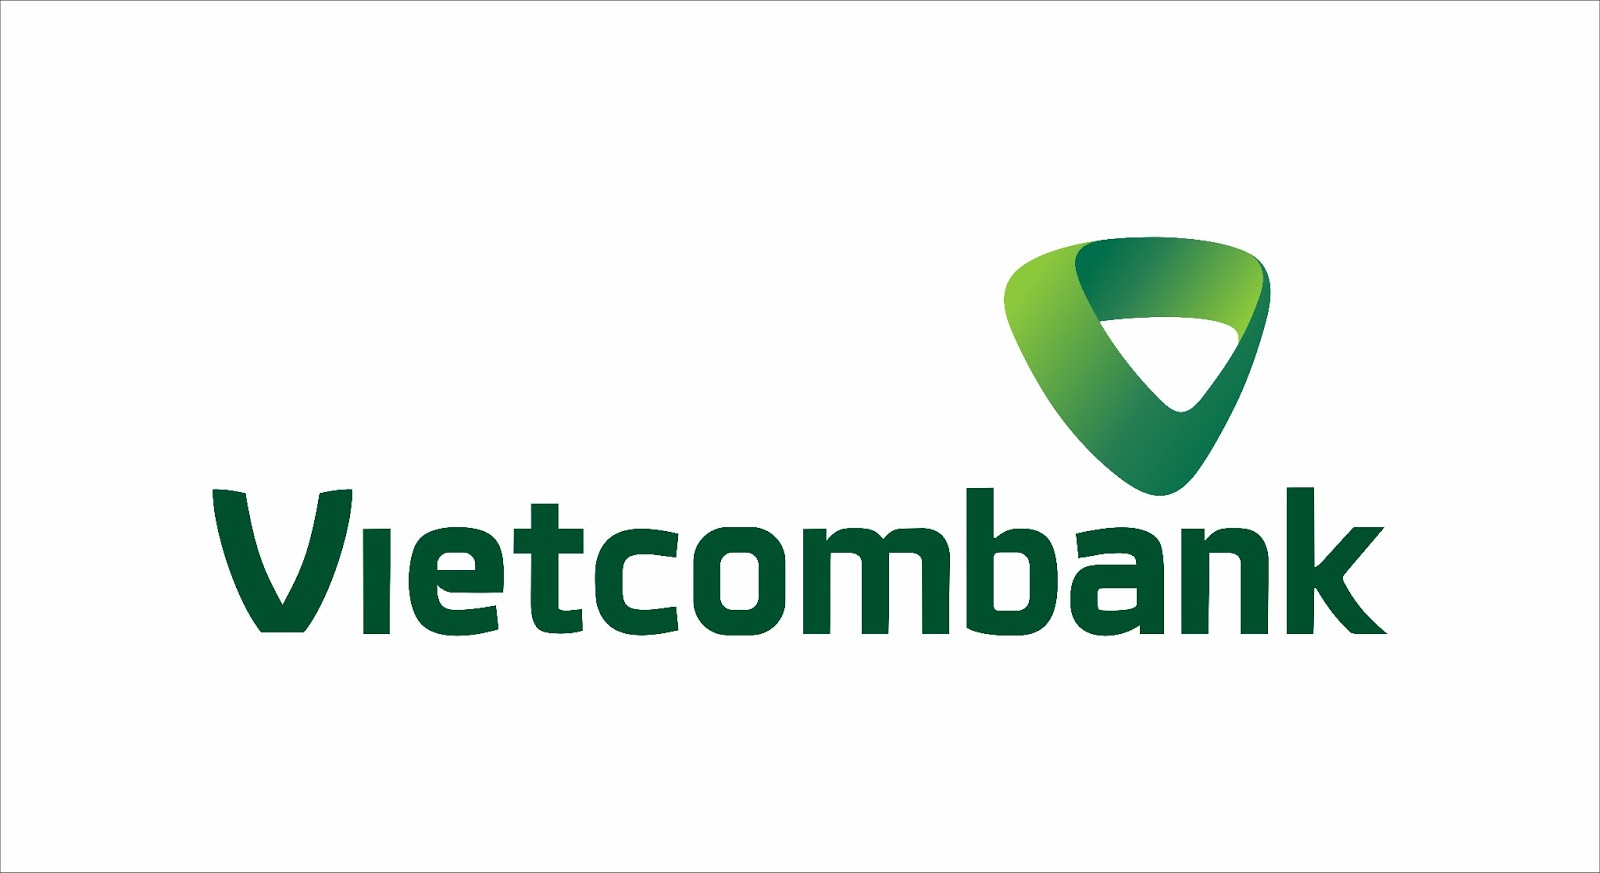 vietcombank-dien-hoa-hai-ha